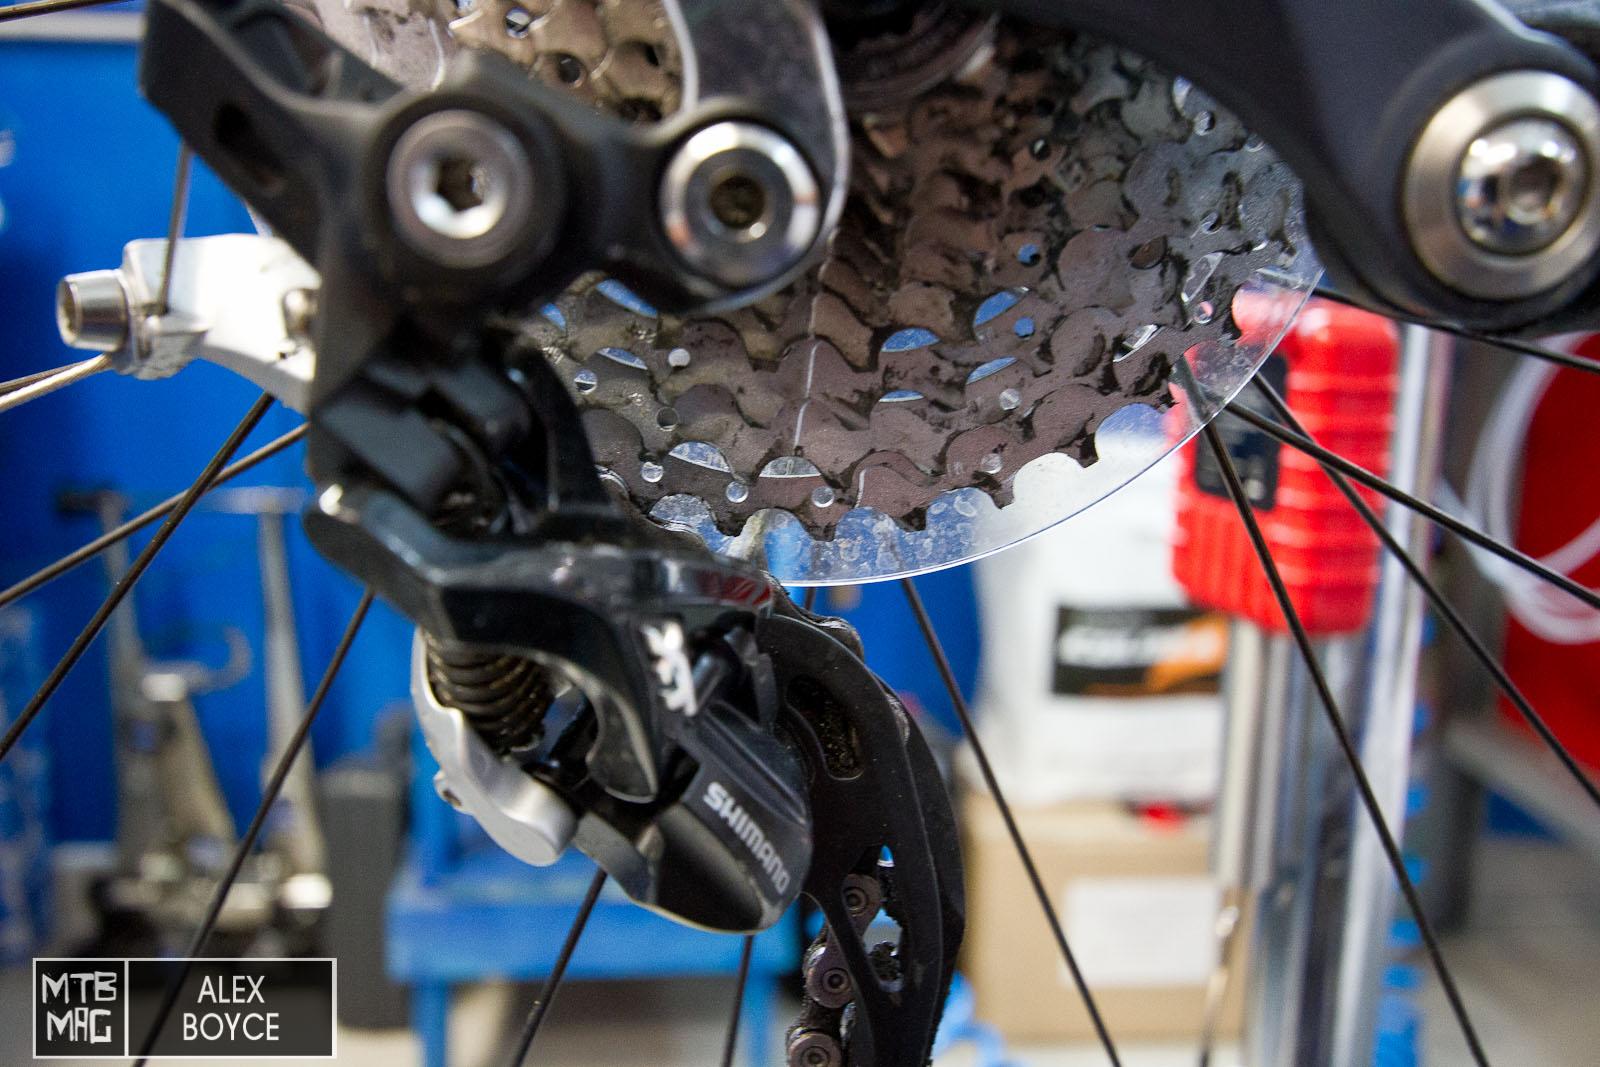 MTB-MAG COM - Mountain Bike Magazine | How To Adjust Your